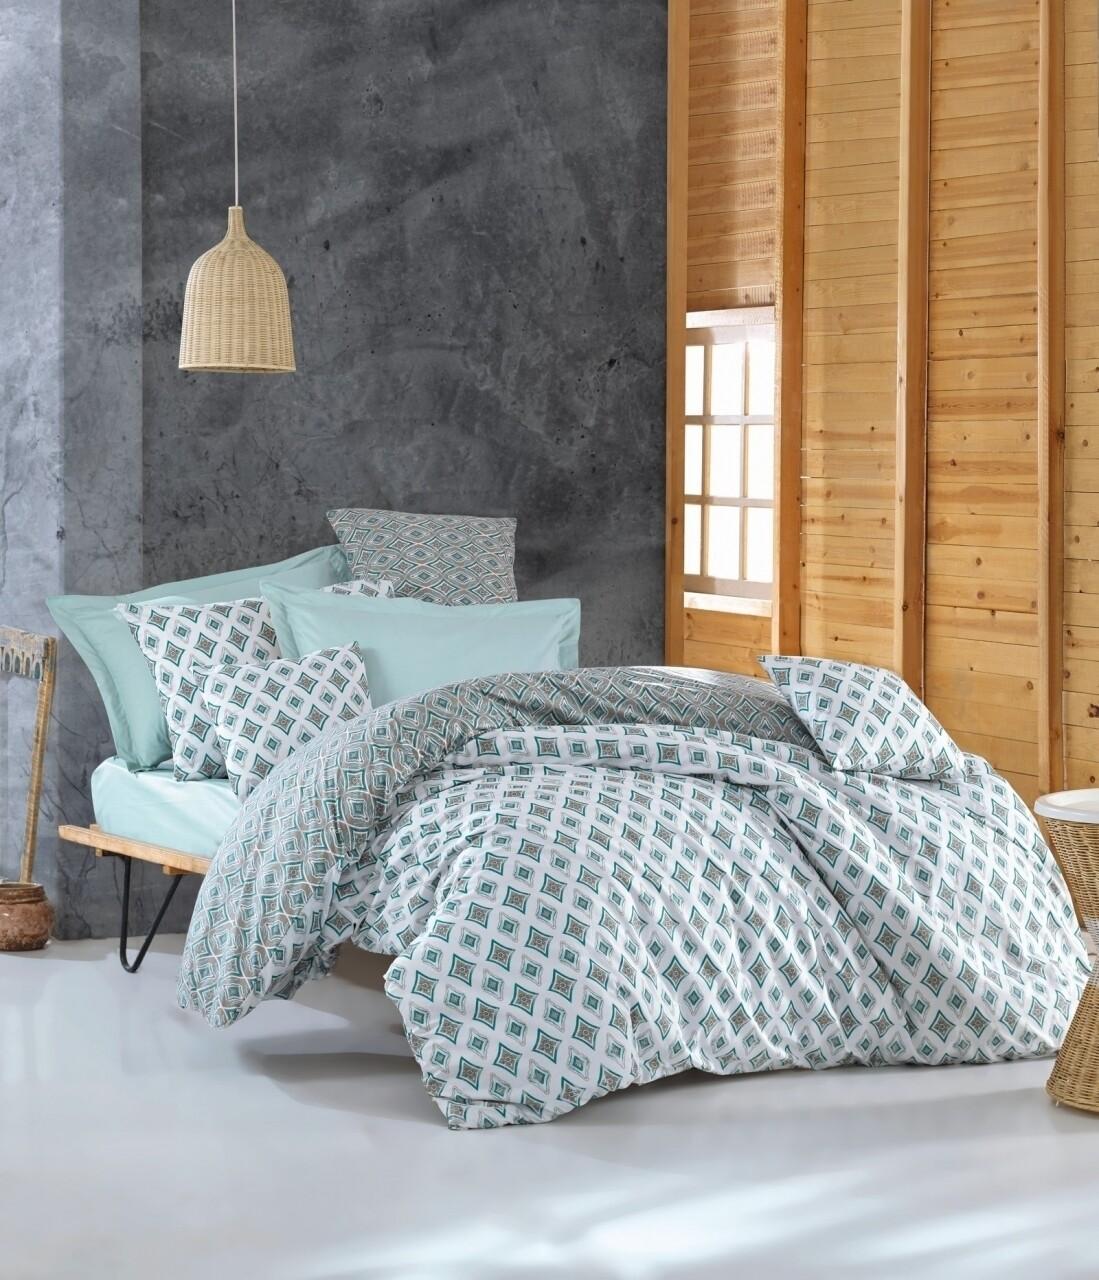 Lenjerie de pat pentru o persoana, 3 piese, 100% bumbac ranforce, Cotton Box, Enza